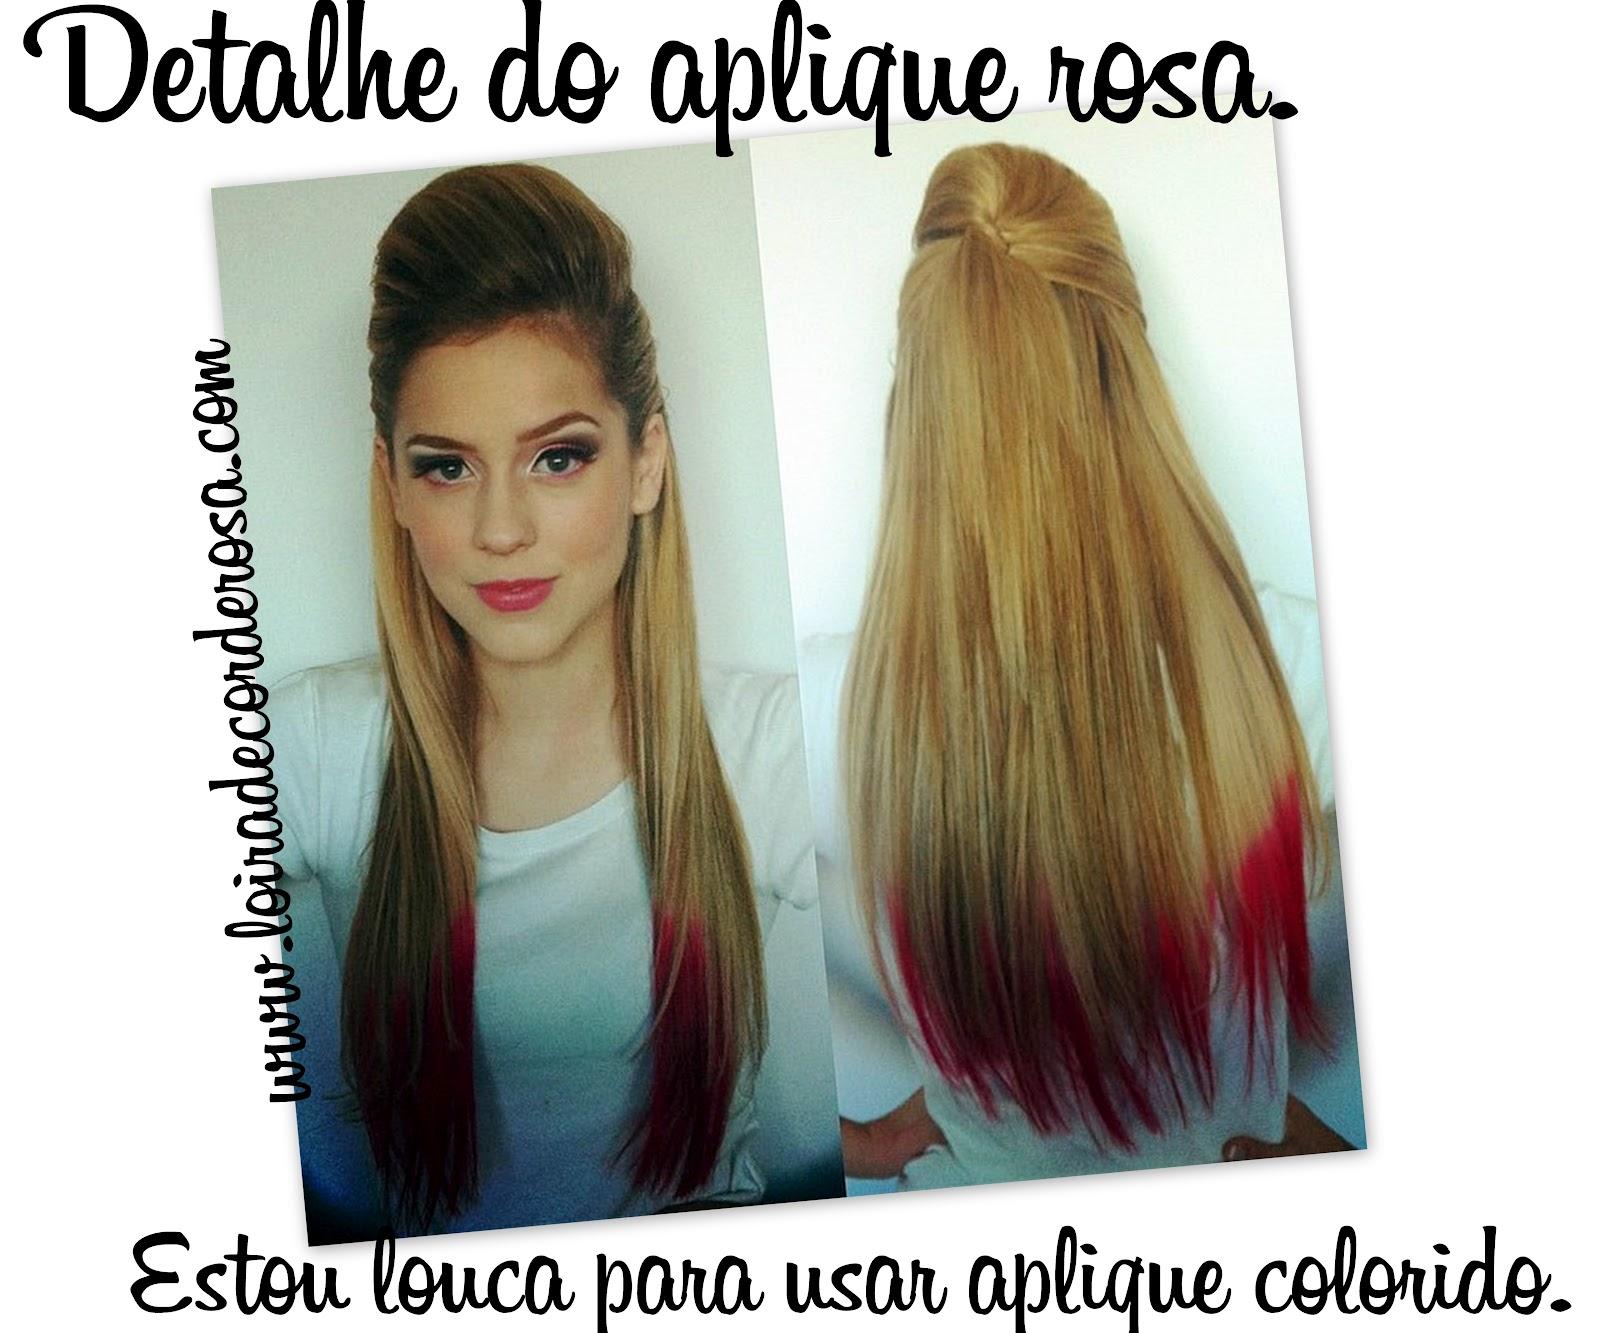 http://2.bp.blogspot.com/-Y8dVlVUfAto/UBx94vX8ukI/AAAAAAAAEEU/41VD_tYZXd4/s1600/Sophia_Abrah%C3%A3o_penteado_hairStyle_Demi_Lovato_cabelo_Colorido.jpg